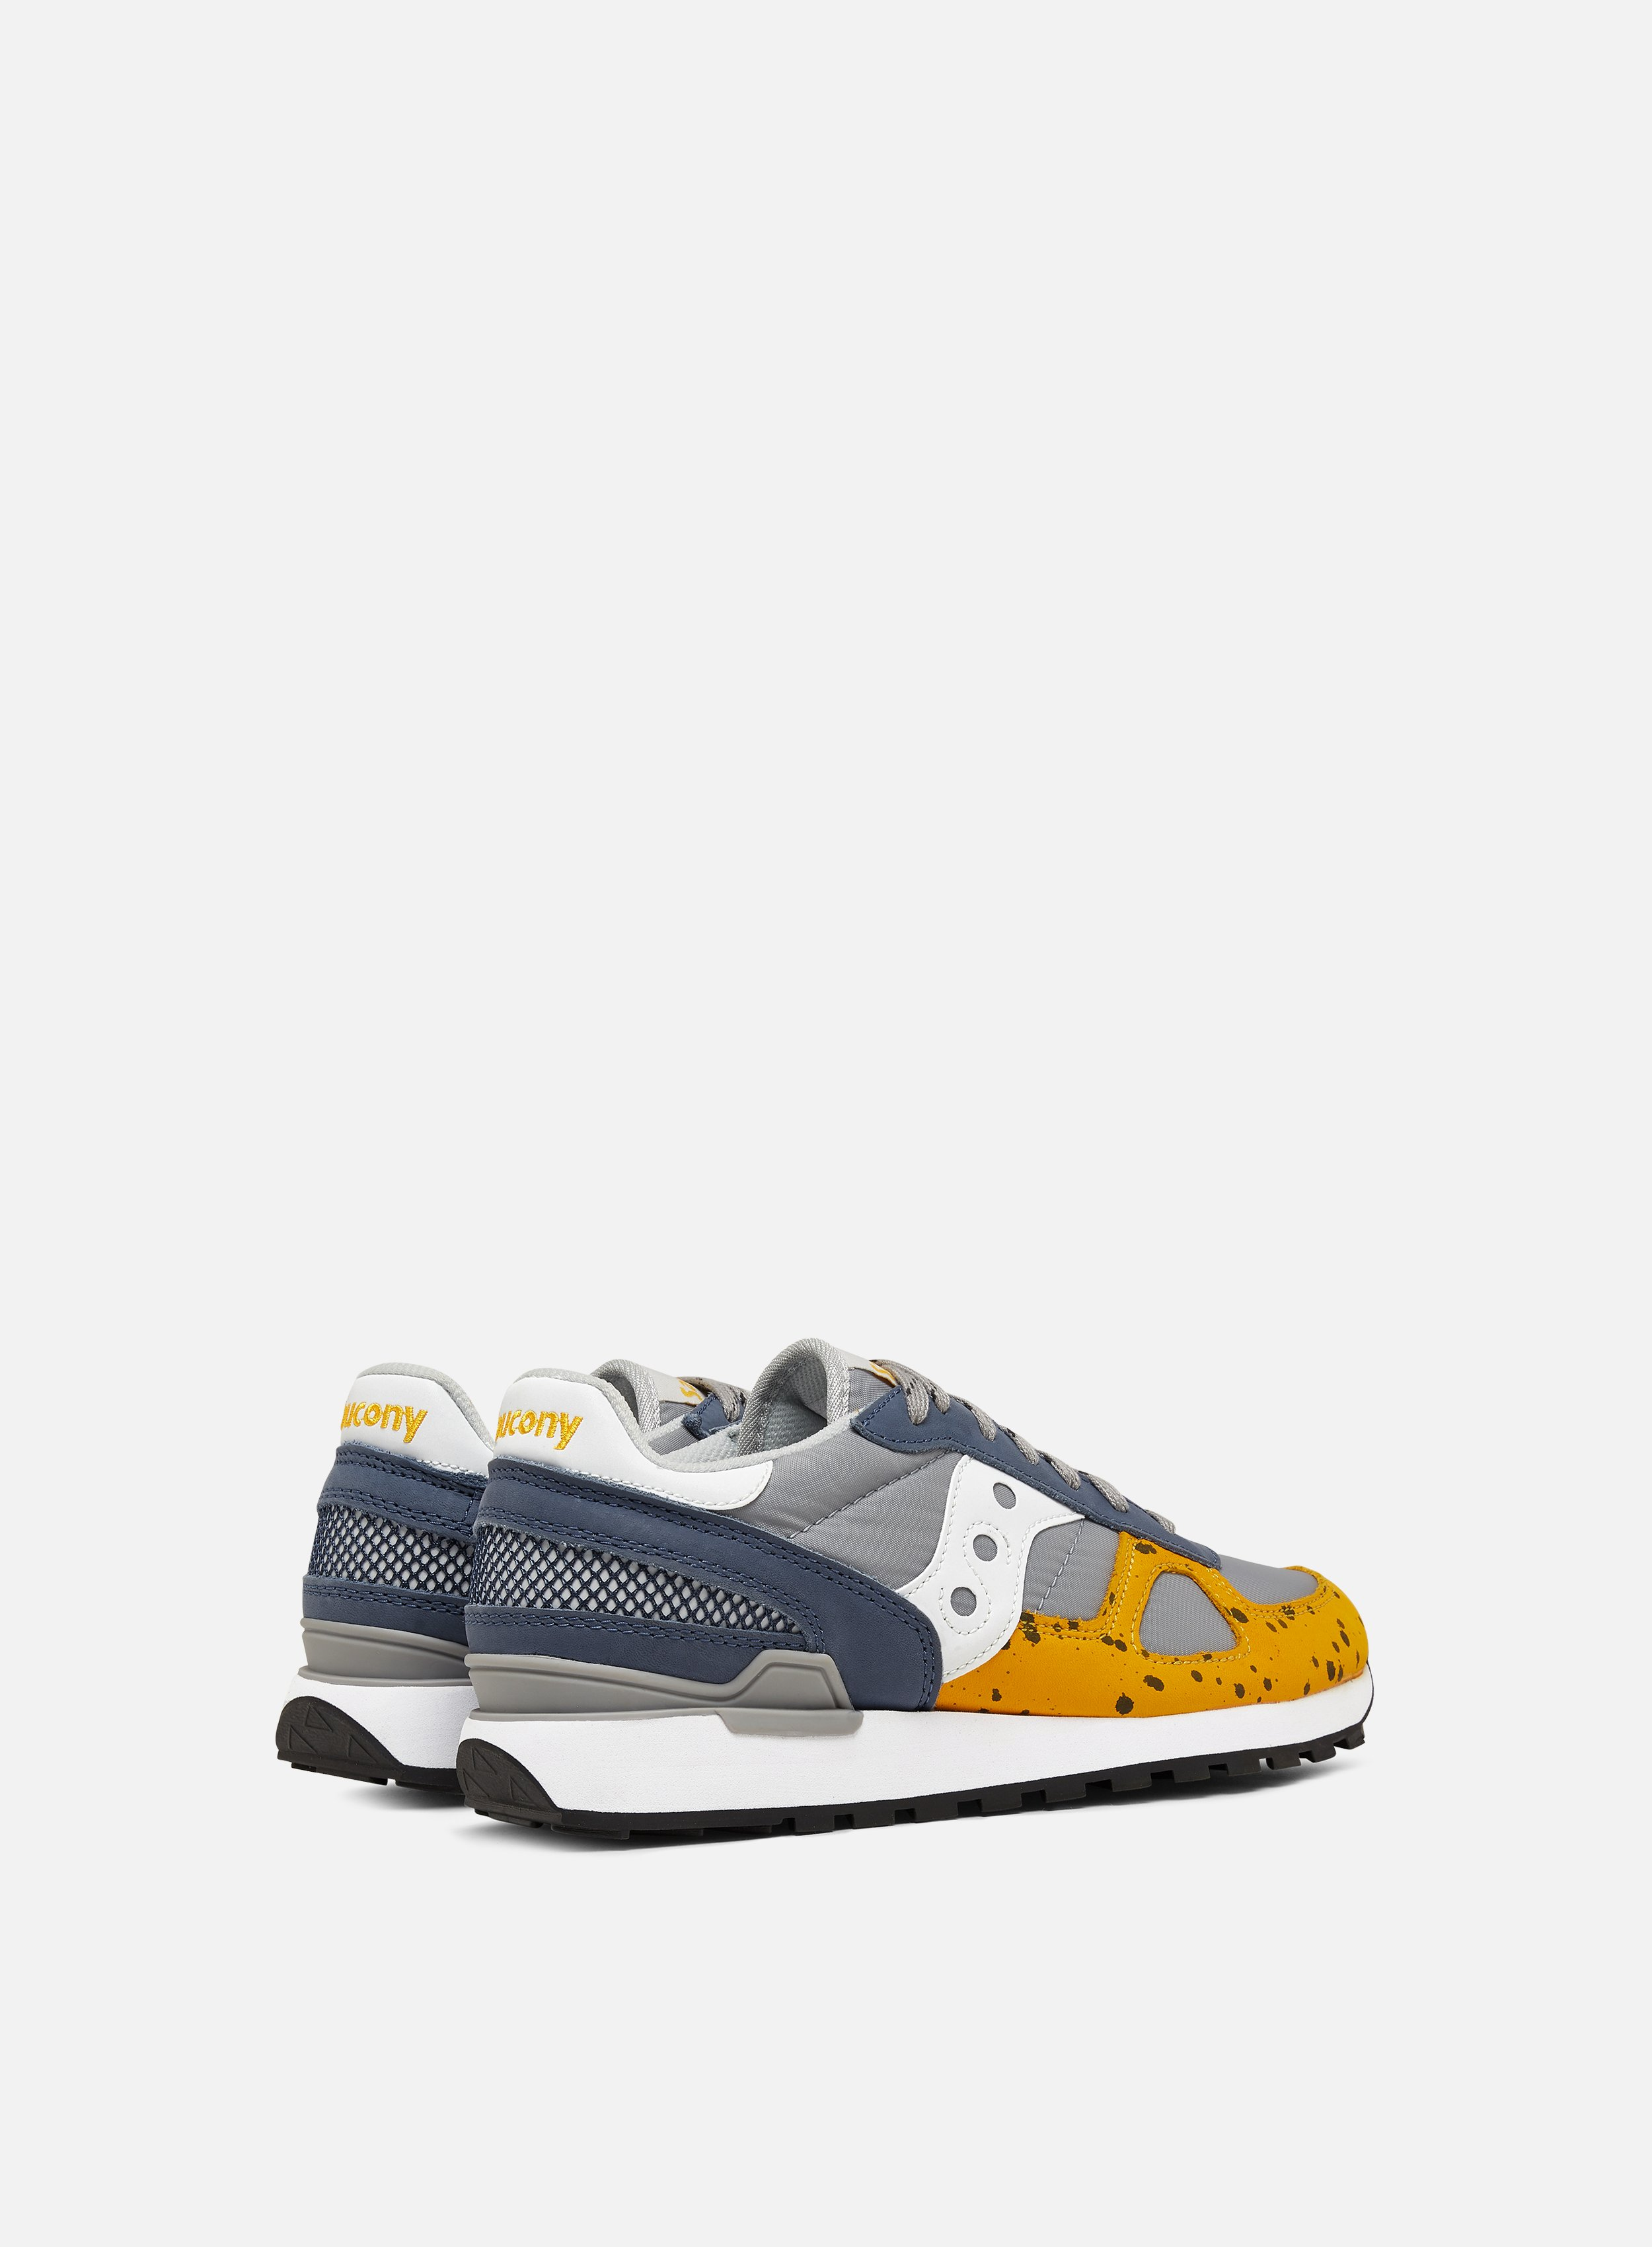 Sneaker Saucony Shadow Uomo s70518 1 grey